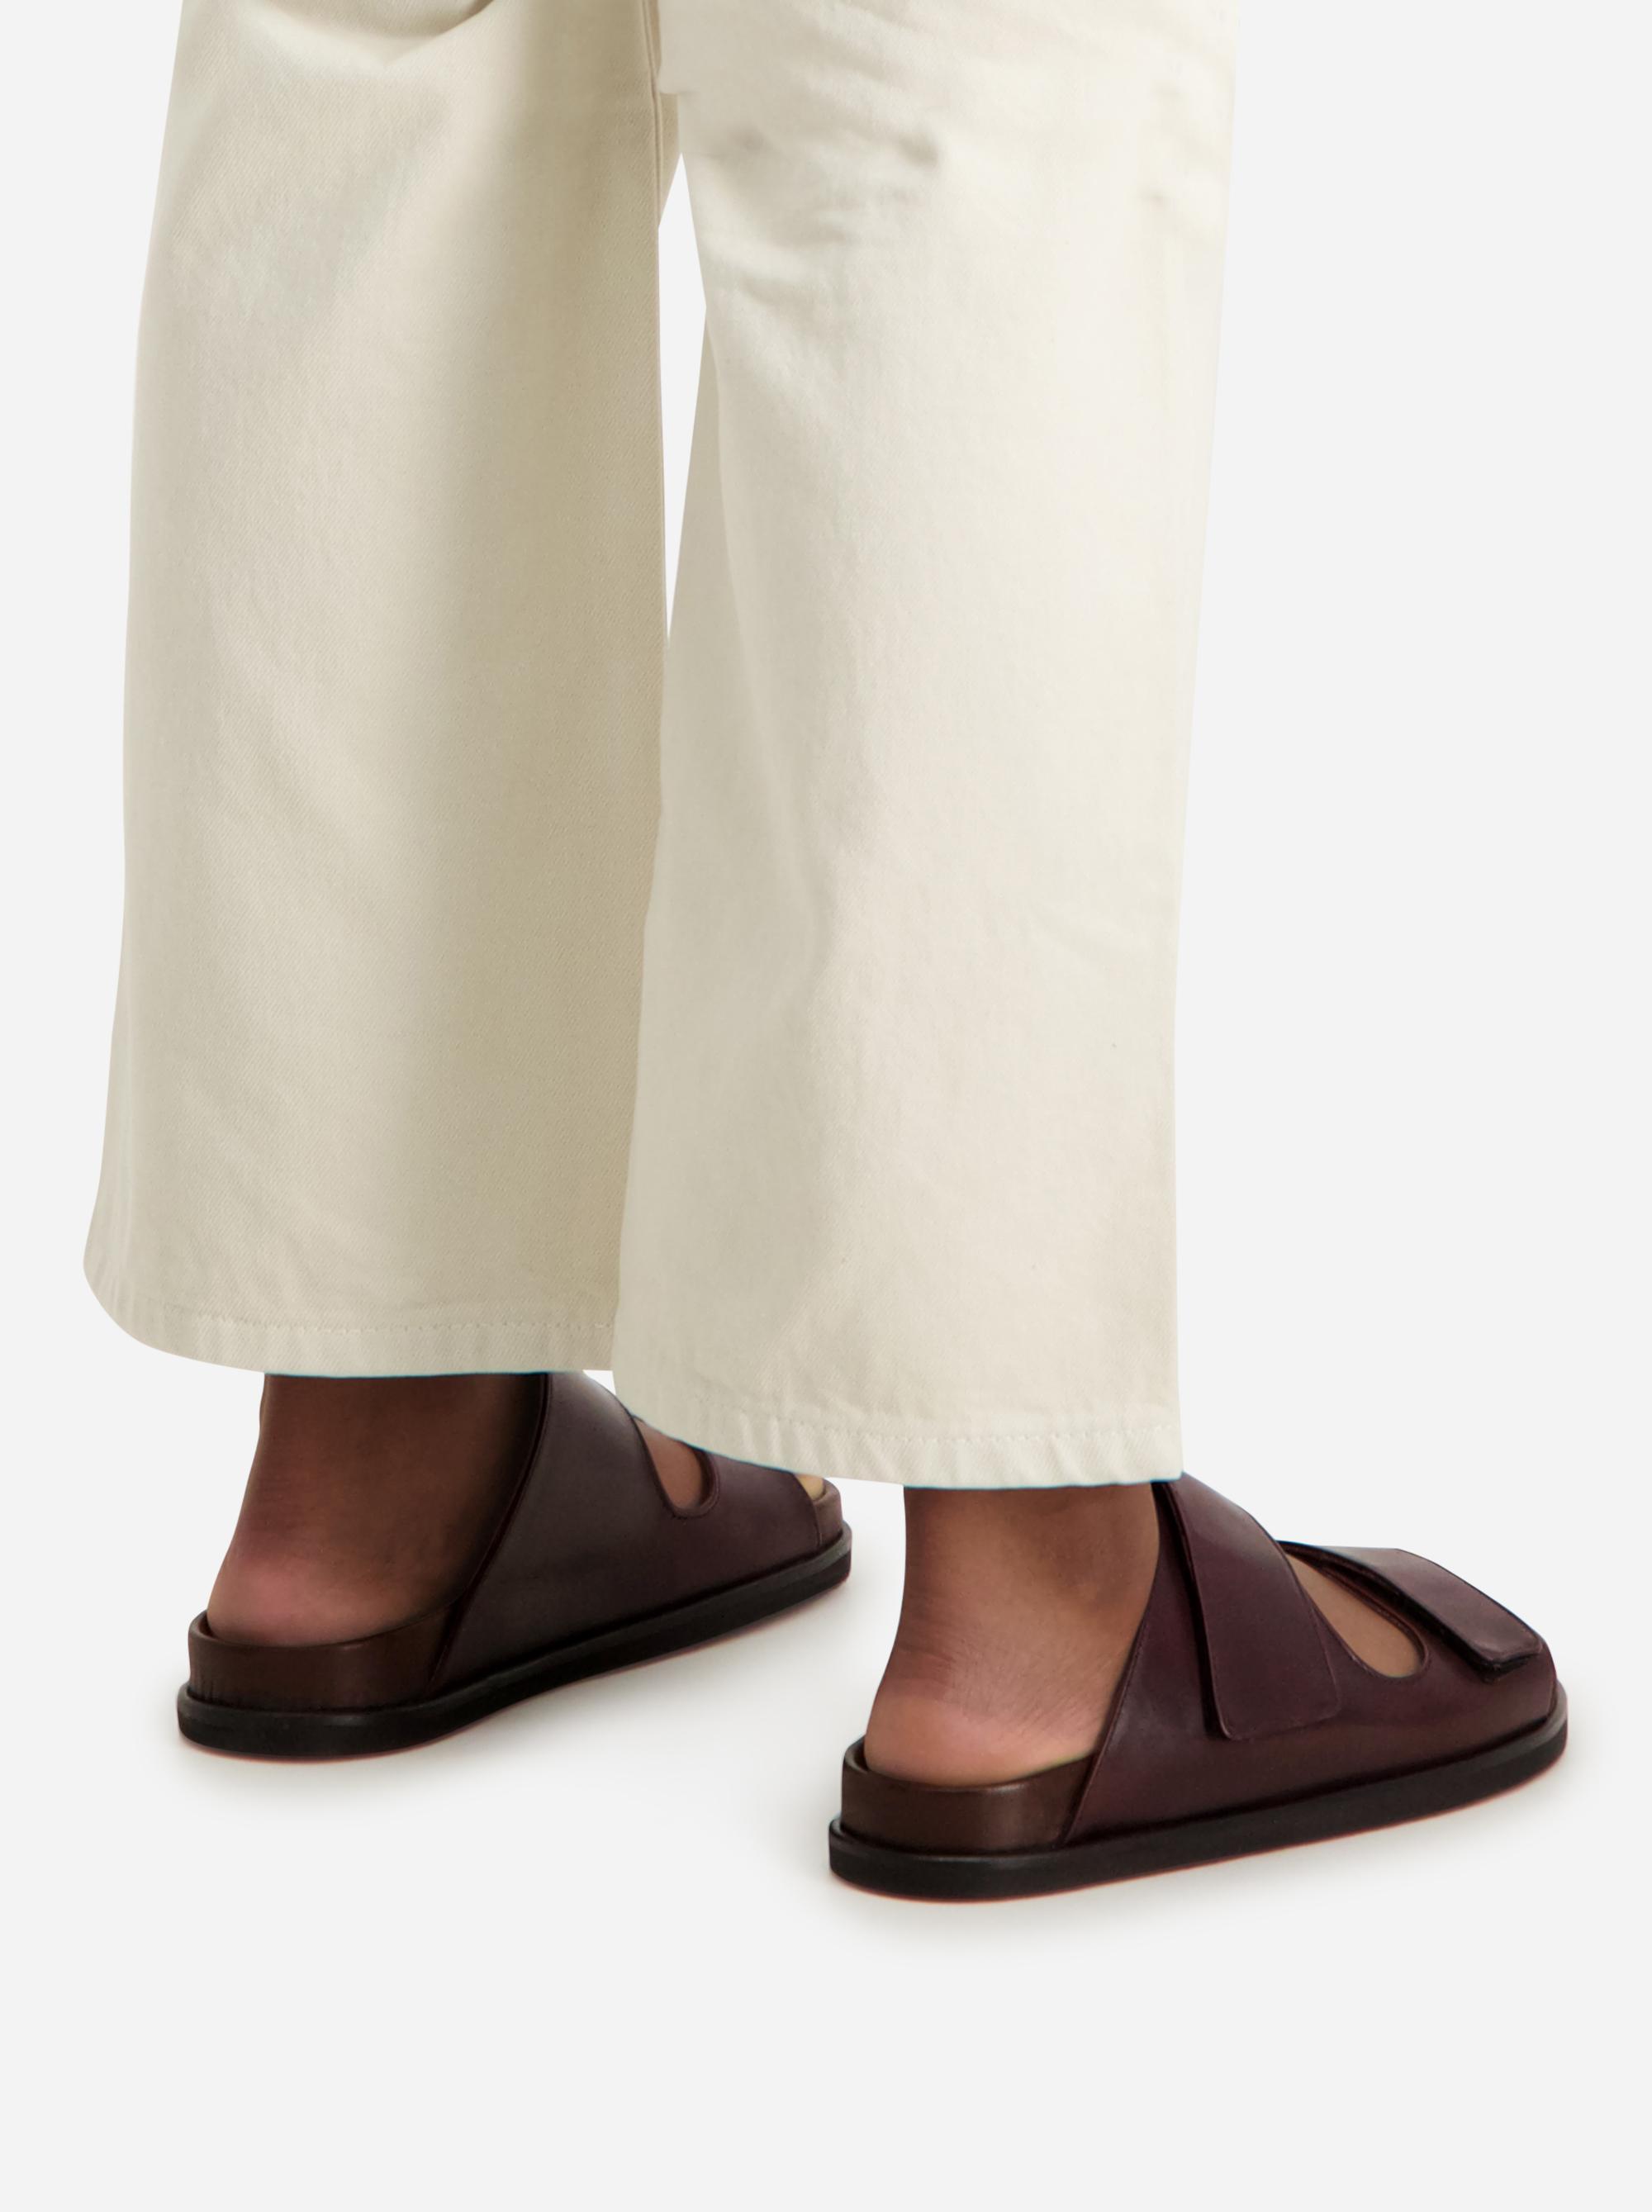 Teym - The Sandal - Burgundy - Women- 2